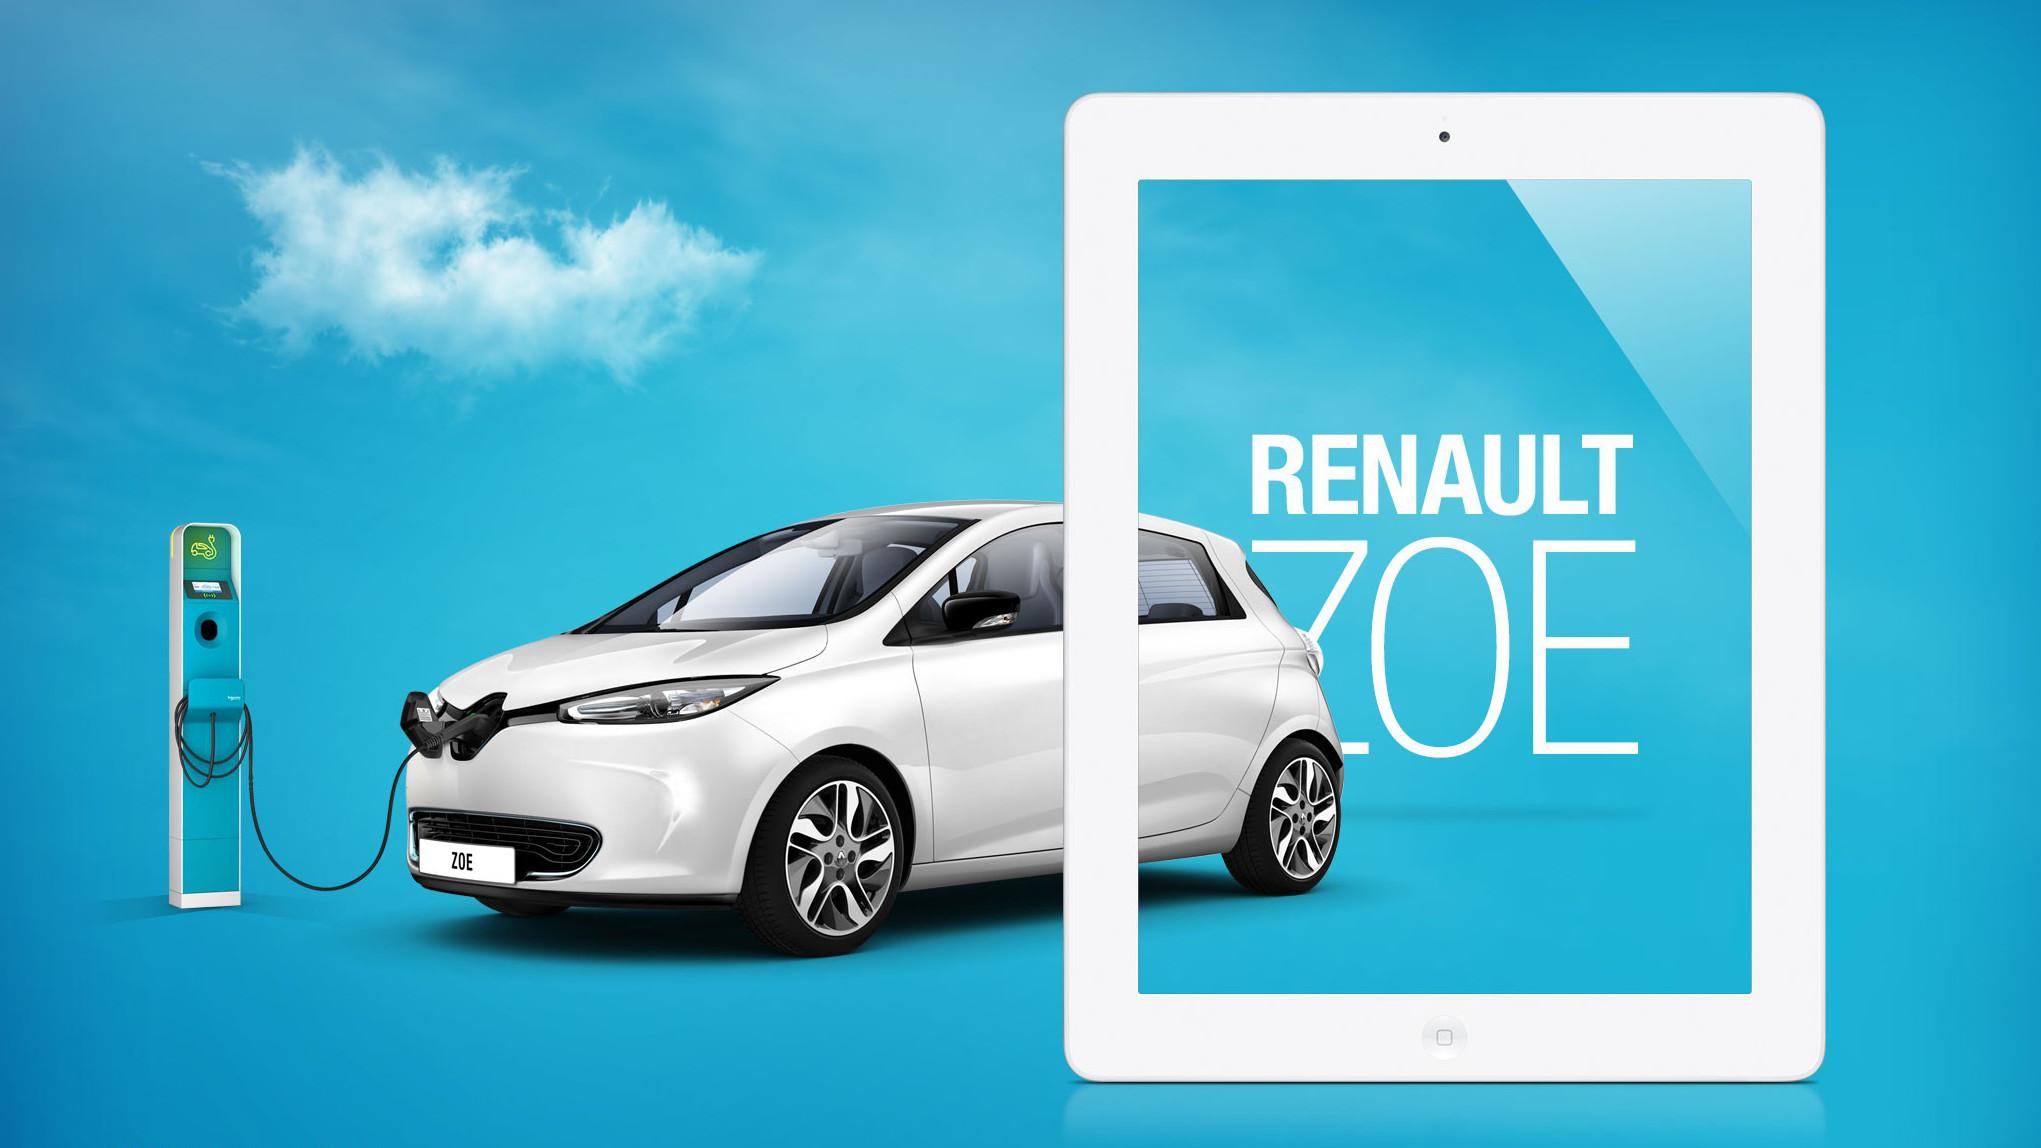 Renault ZOE auch als App für iPad, Android folgt